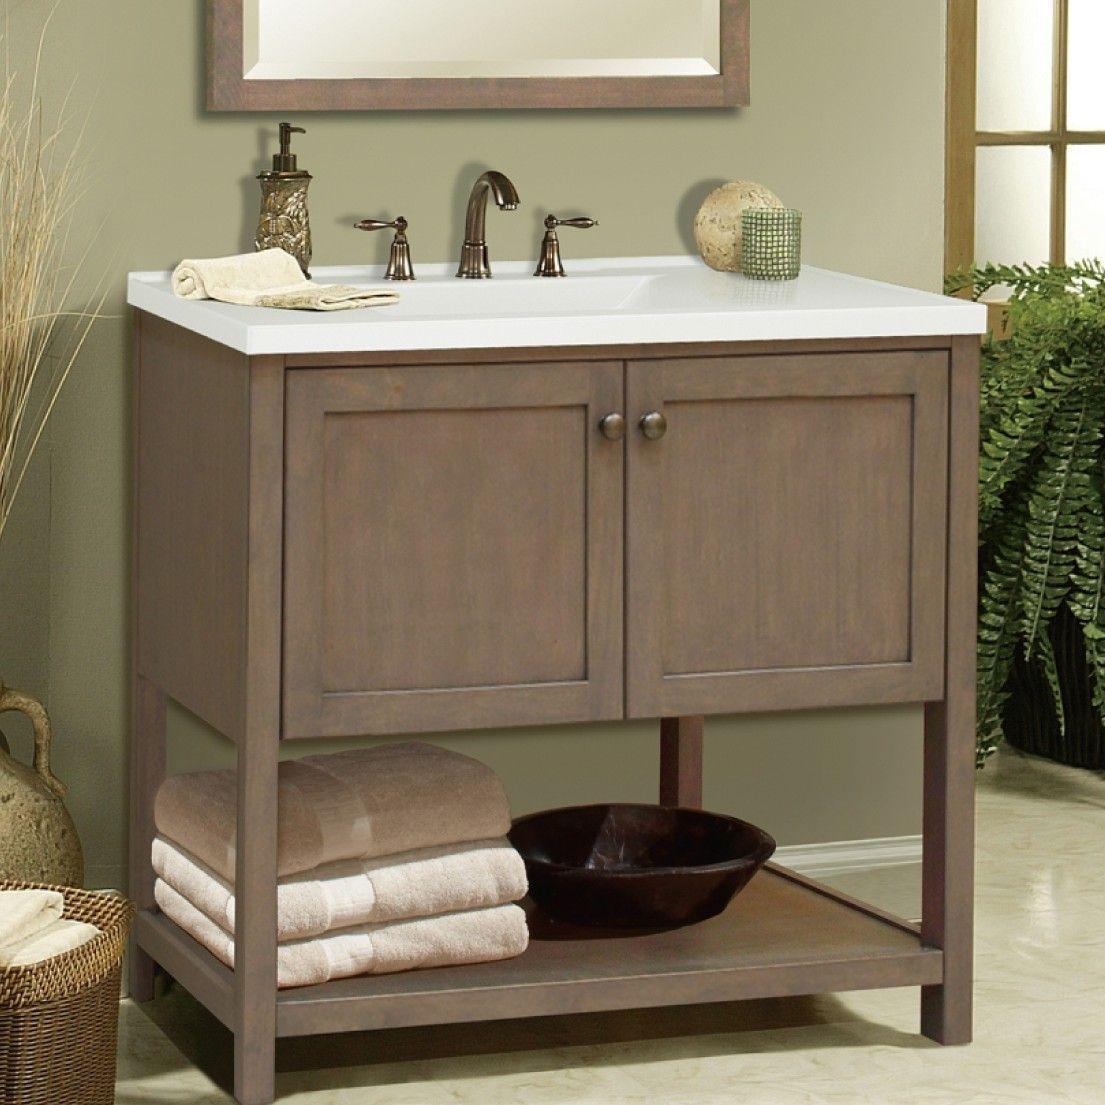 Milani 36 Single Bathroom Vanity Base Only Bathroom Vanity Base